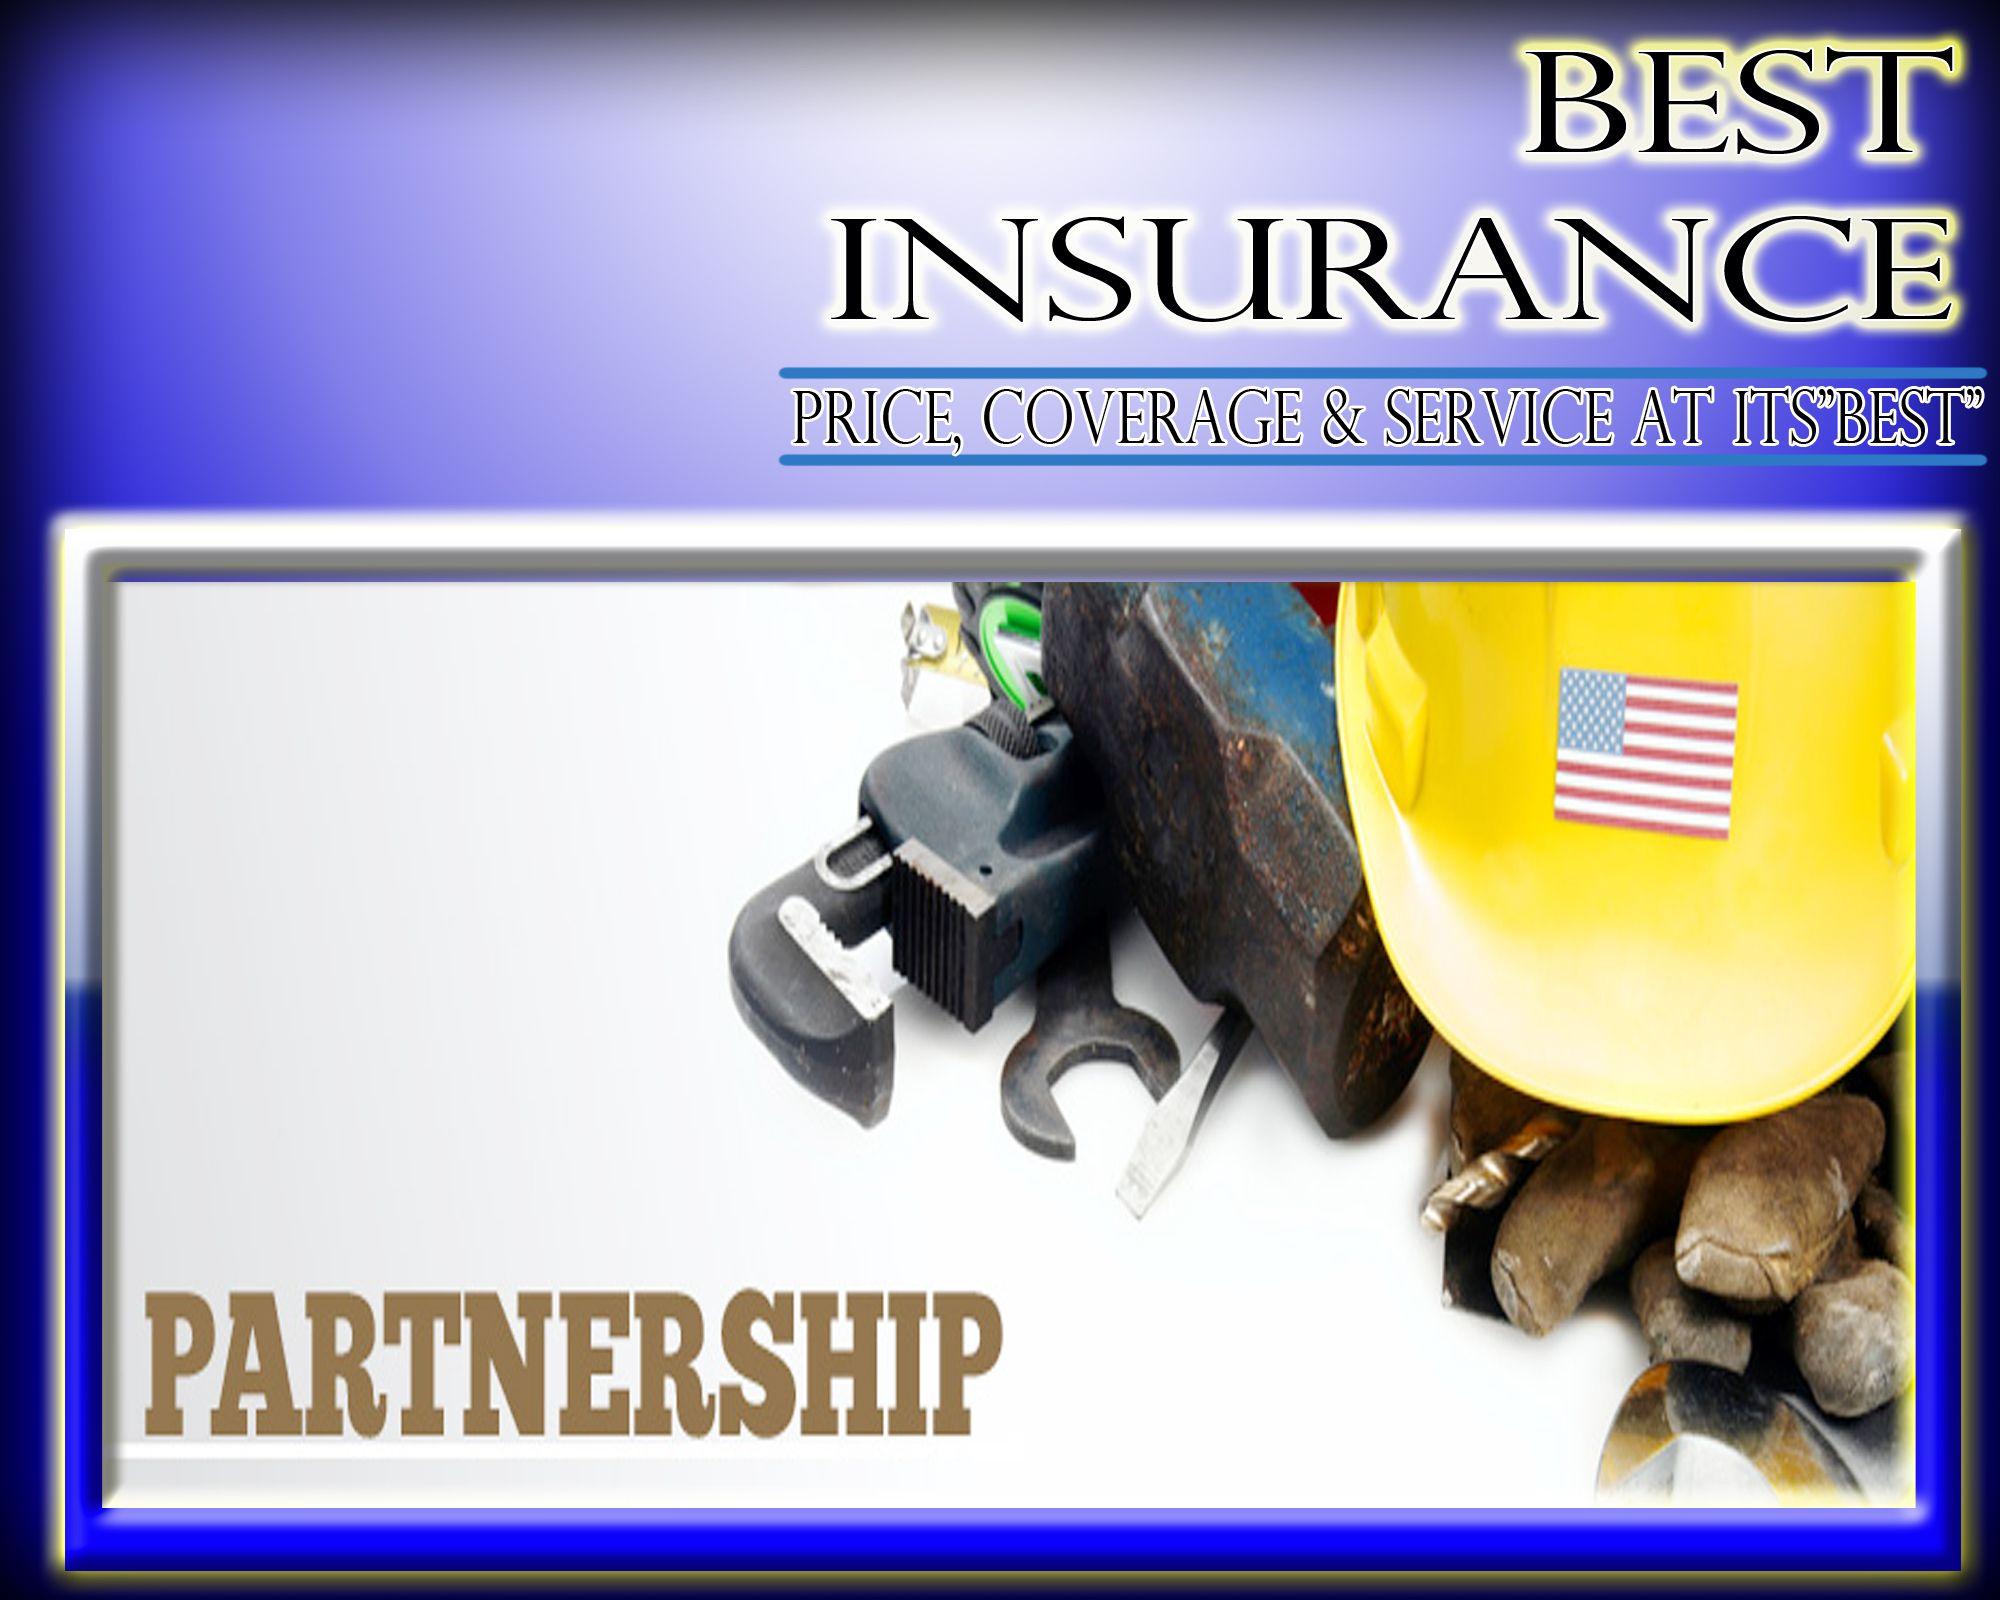 Homeownersinsurancefortlauderdale labor insurance best